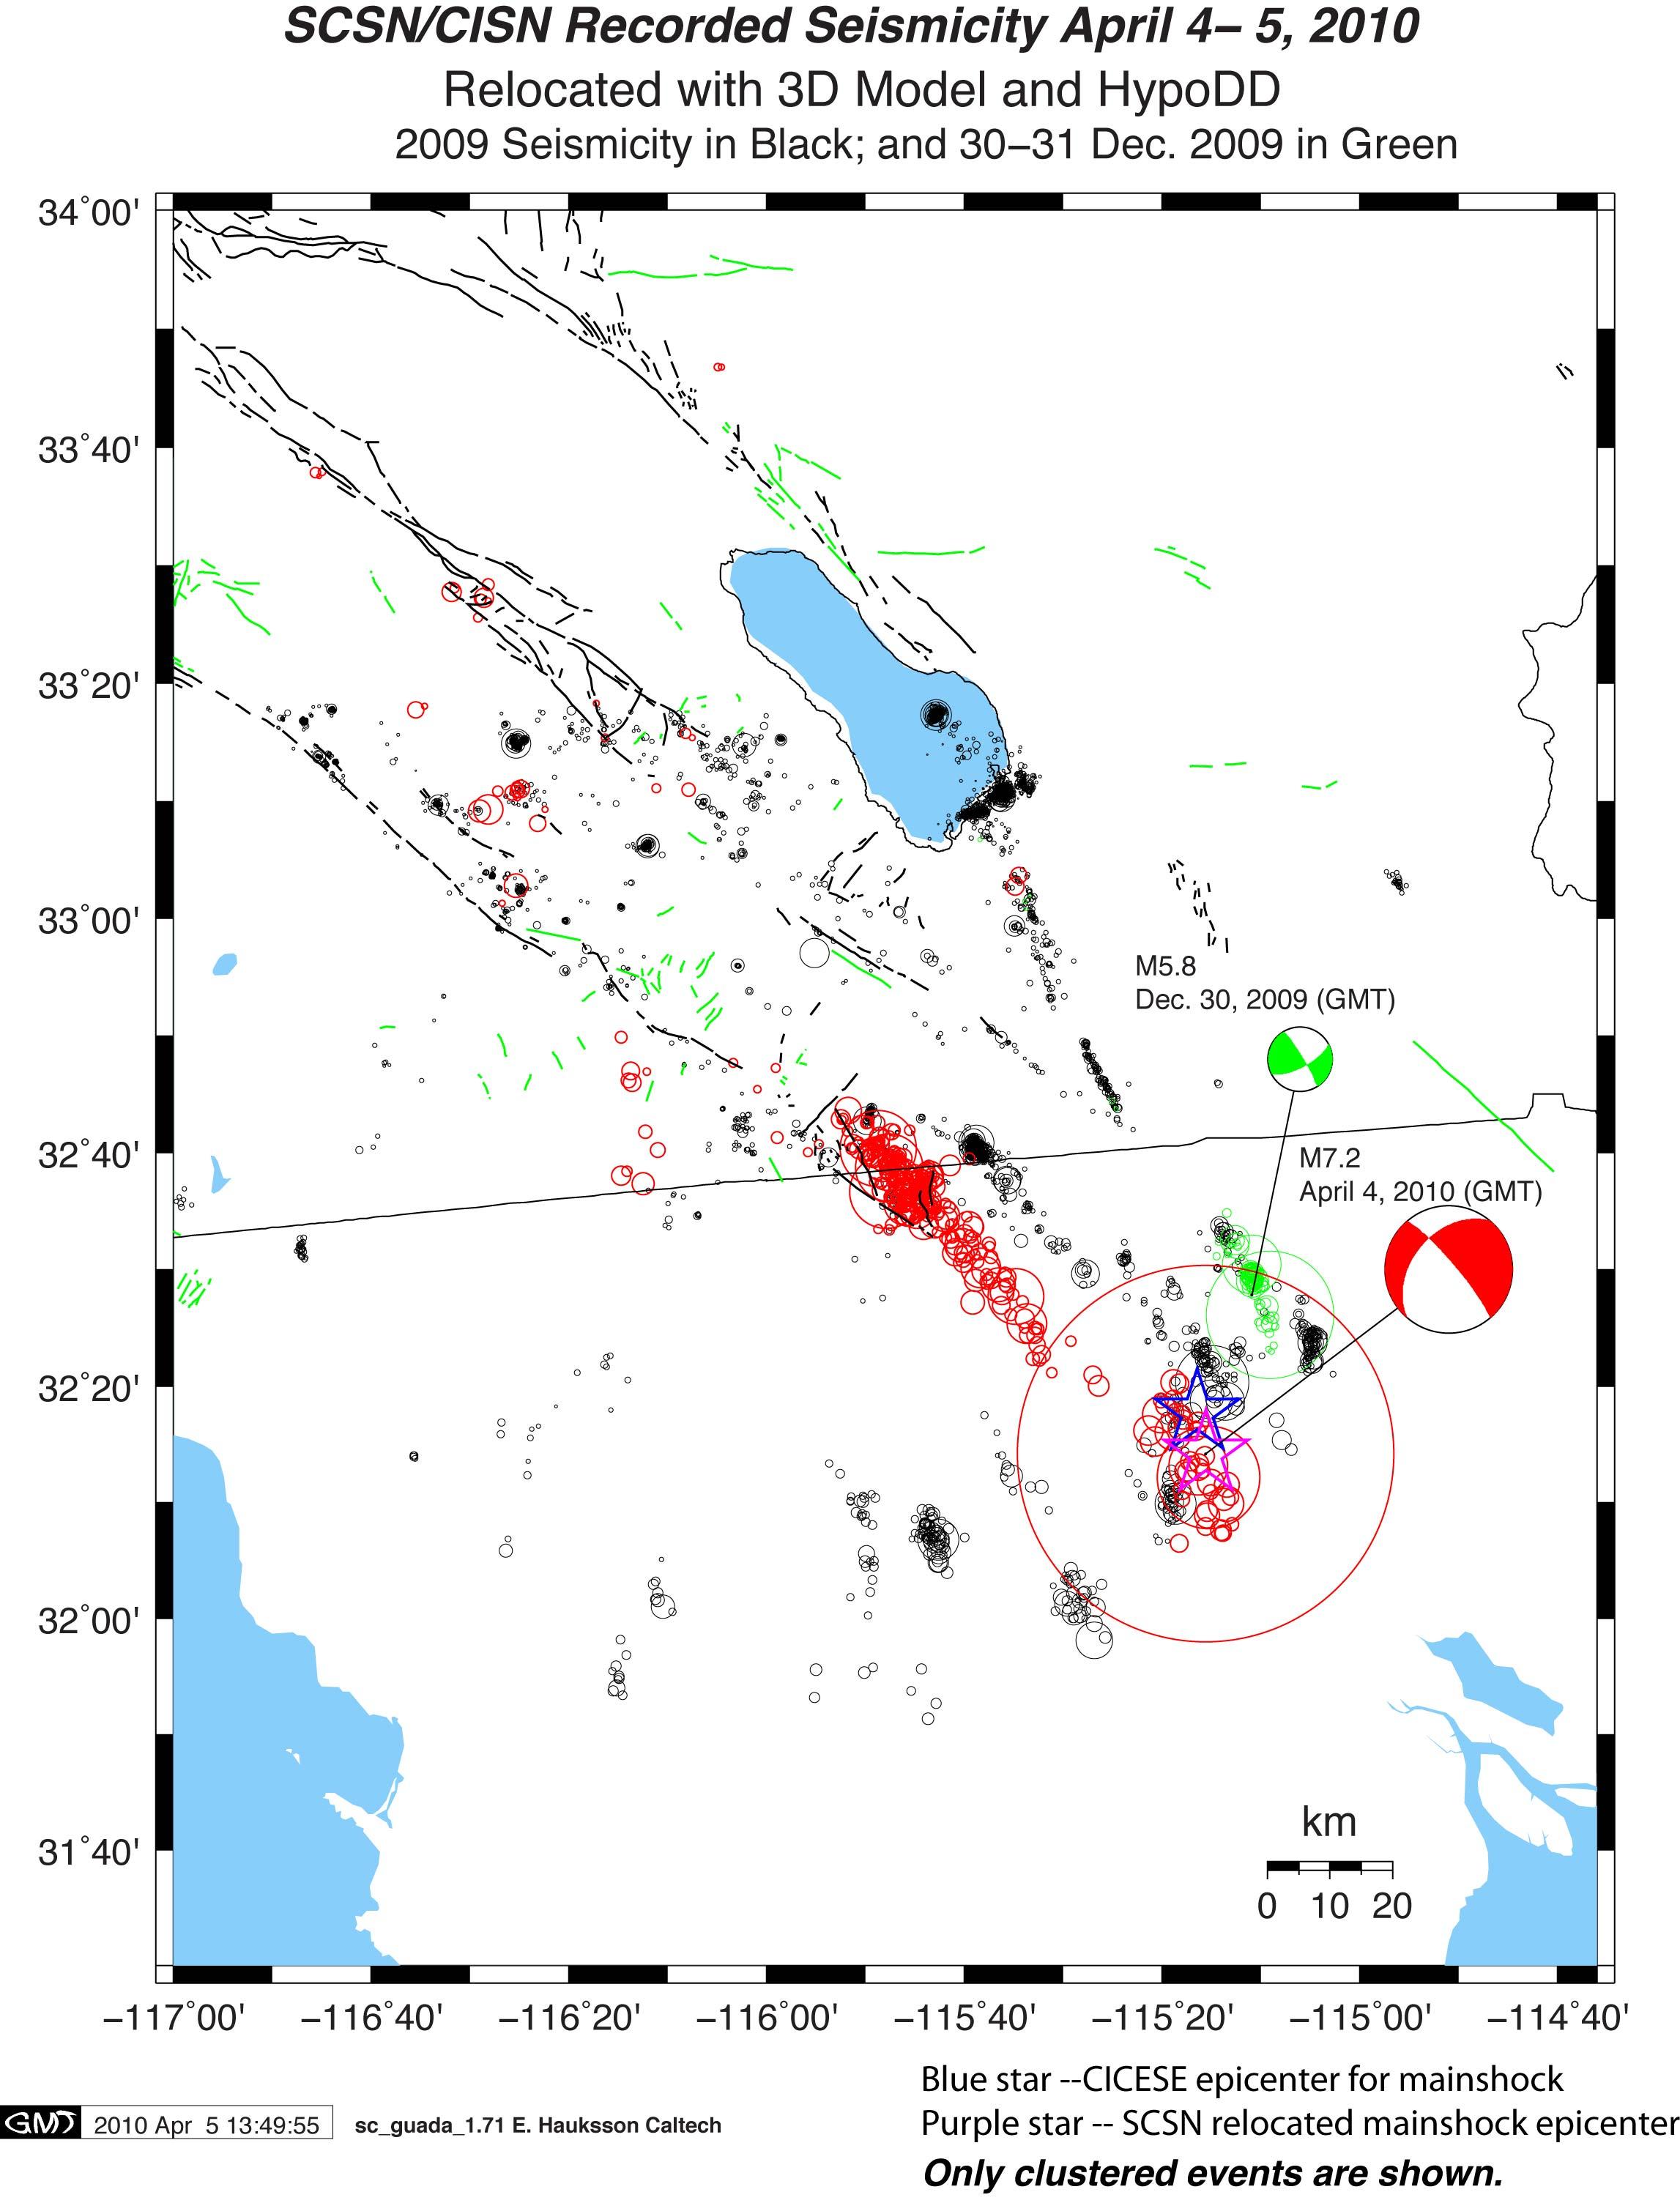 2010 04 04 - El Mayor - Cucapah Earthquake | response scec org